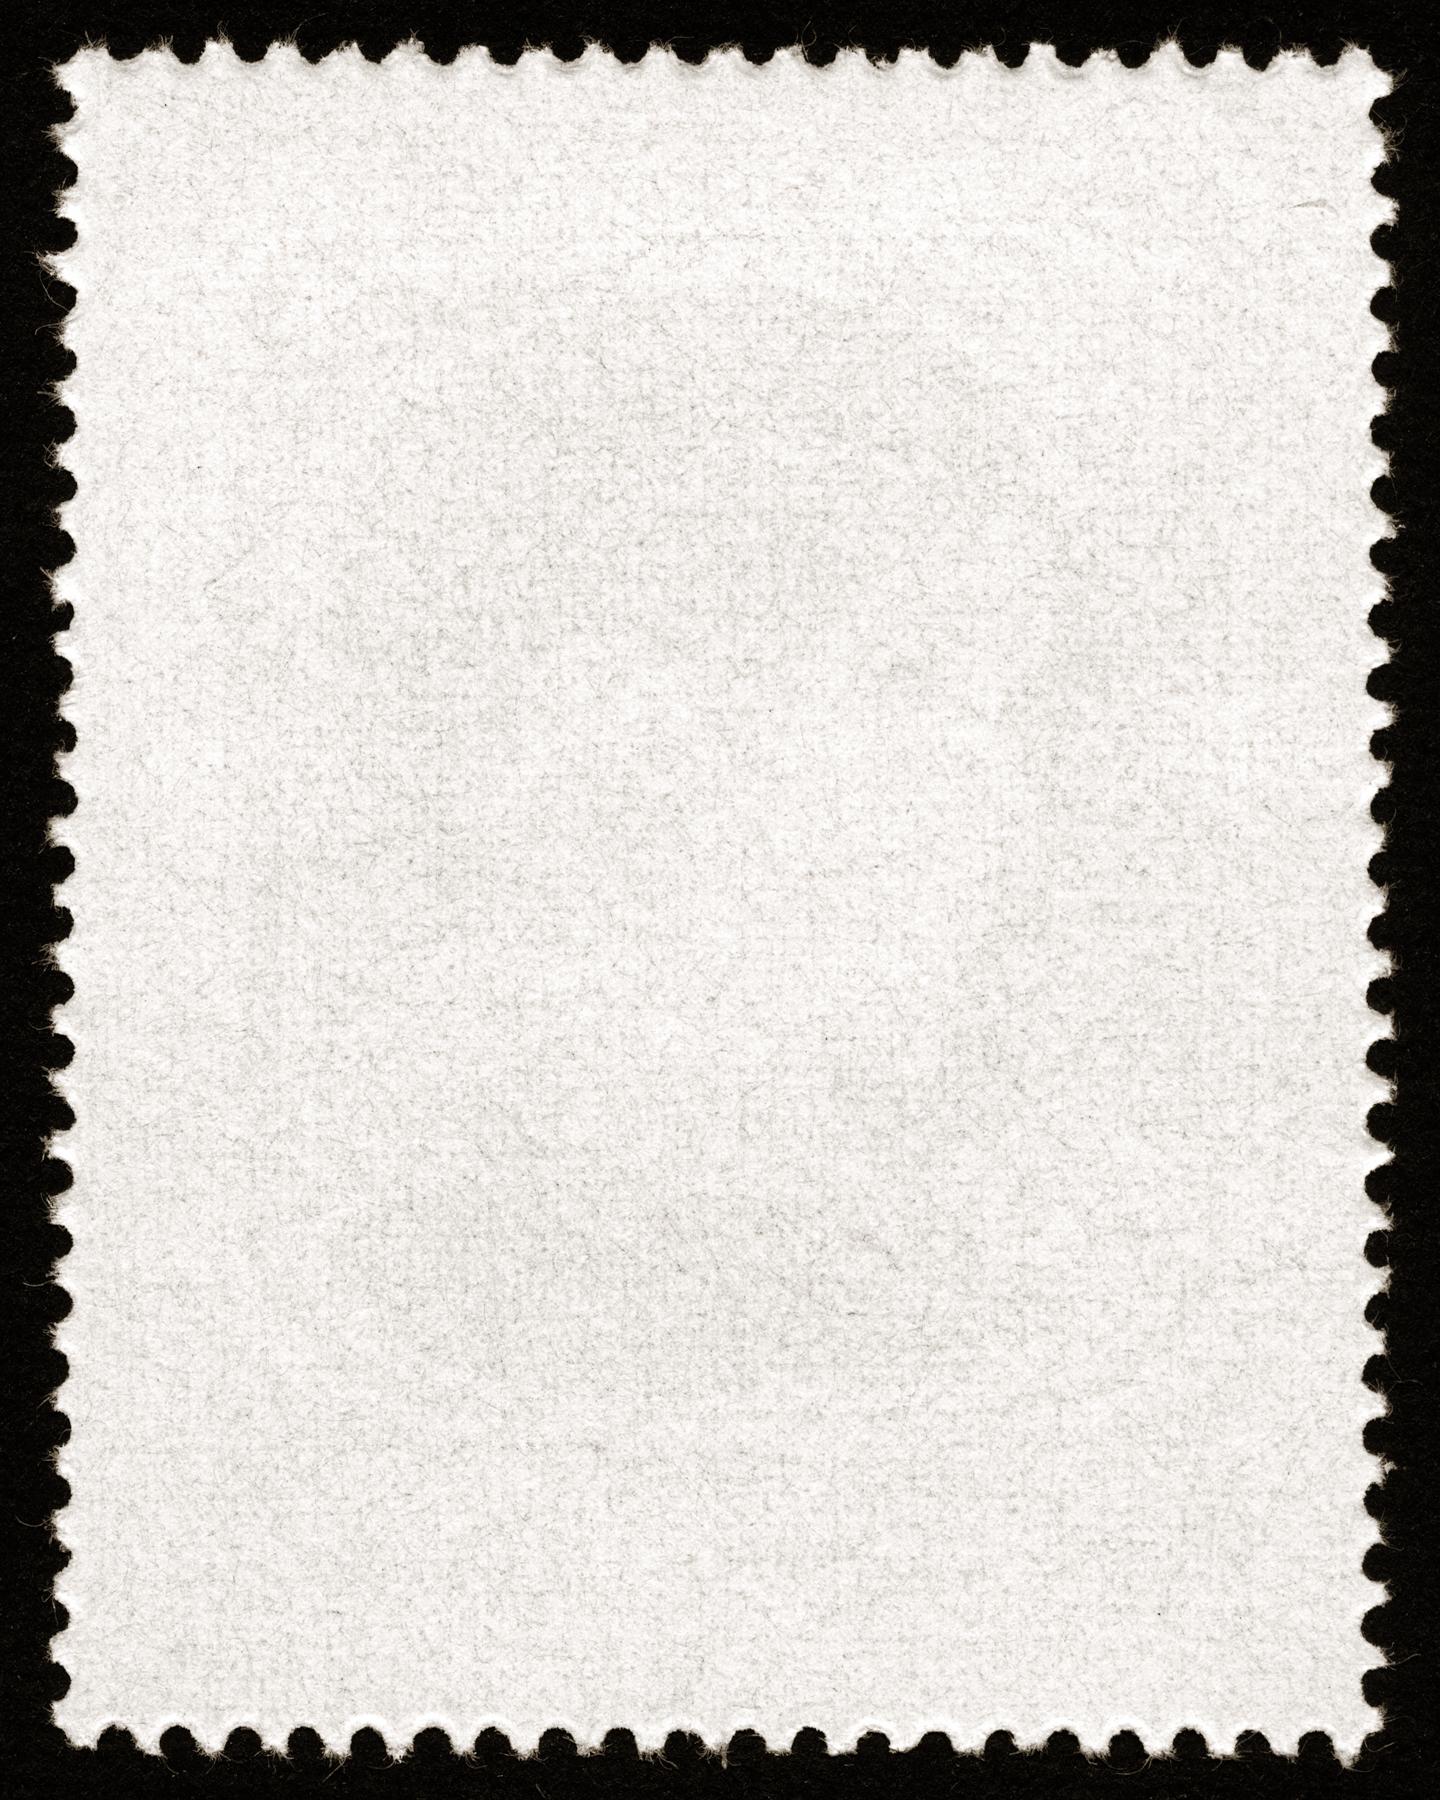 Blank Stamp, Backdrop, Scrap, Picture, Plain, HQ Photo